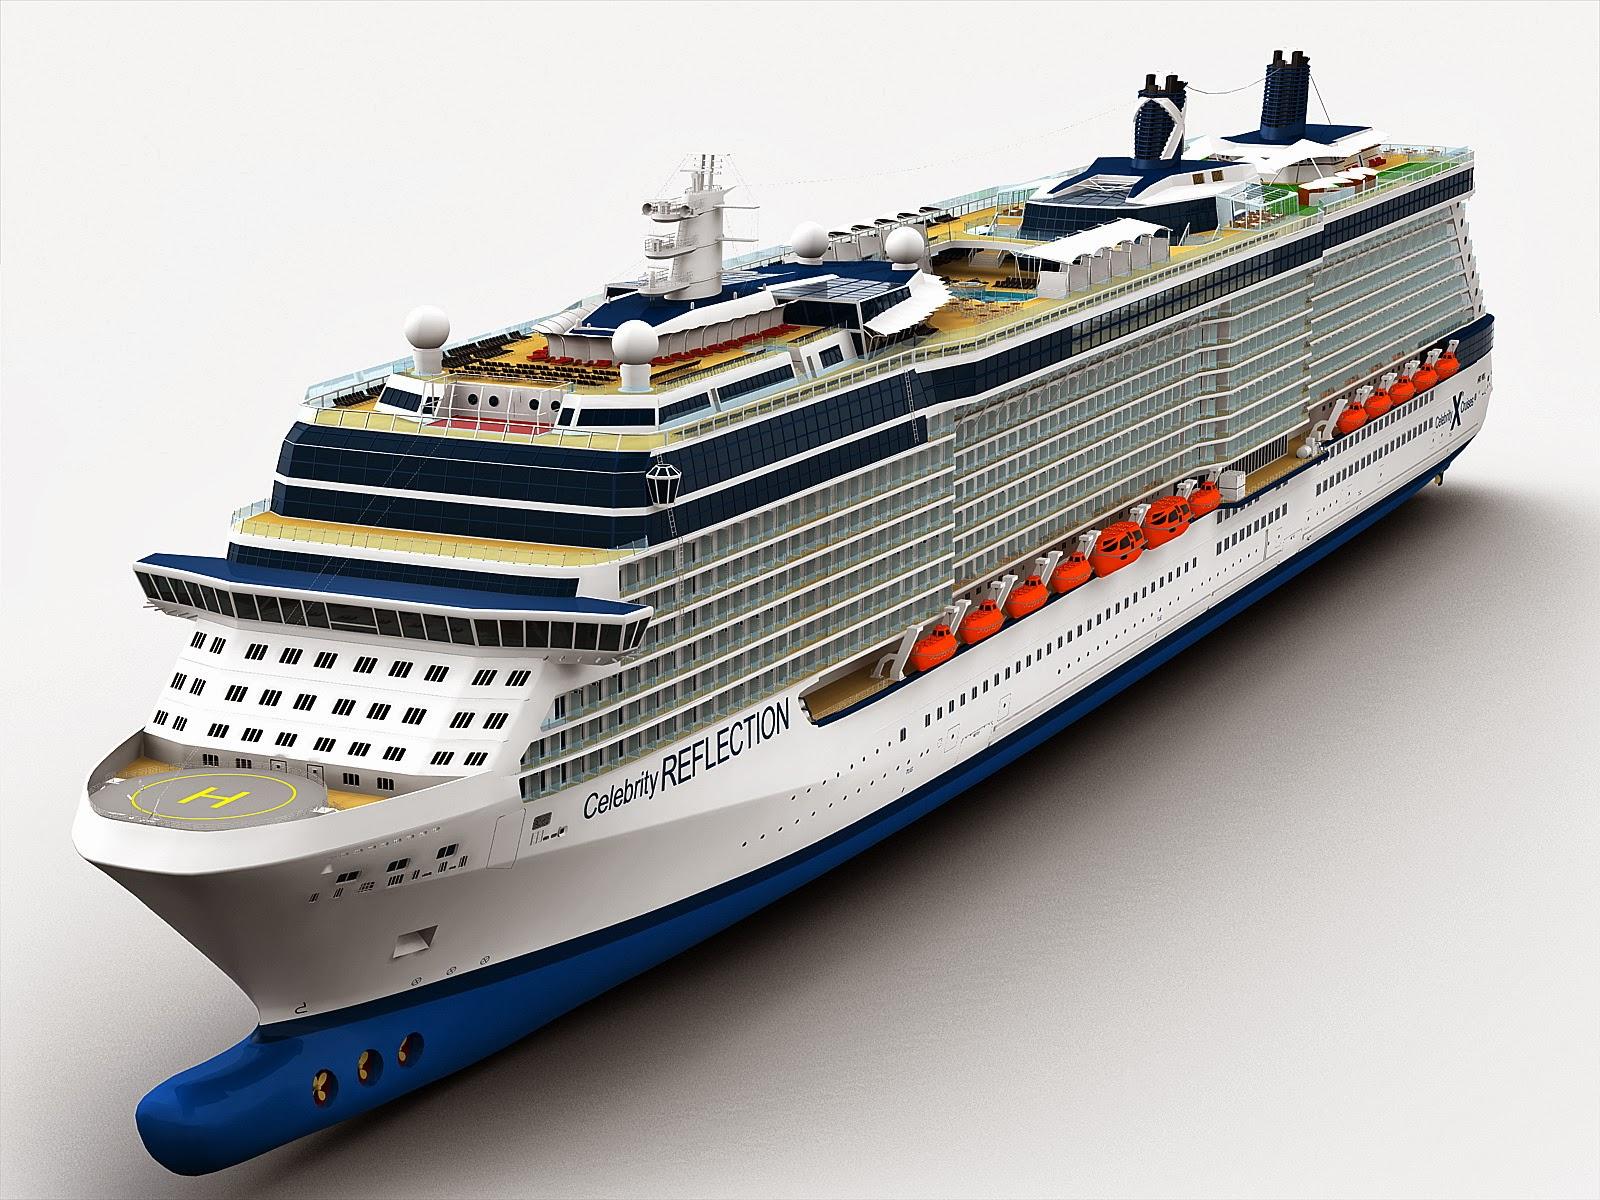 Florida Cruise Traveler Navy Celebrity Reflection 3d View